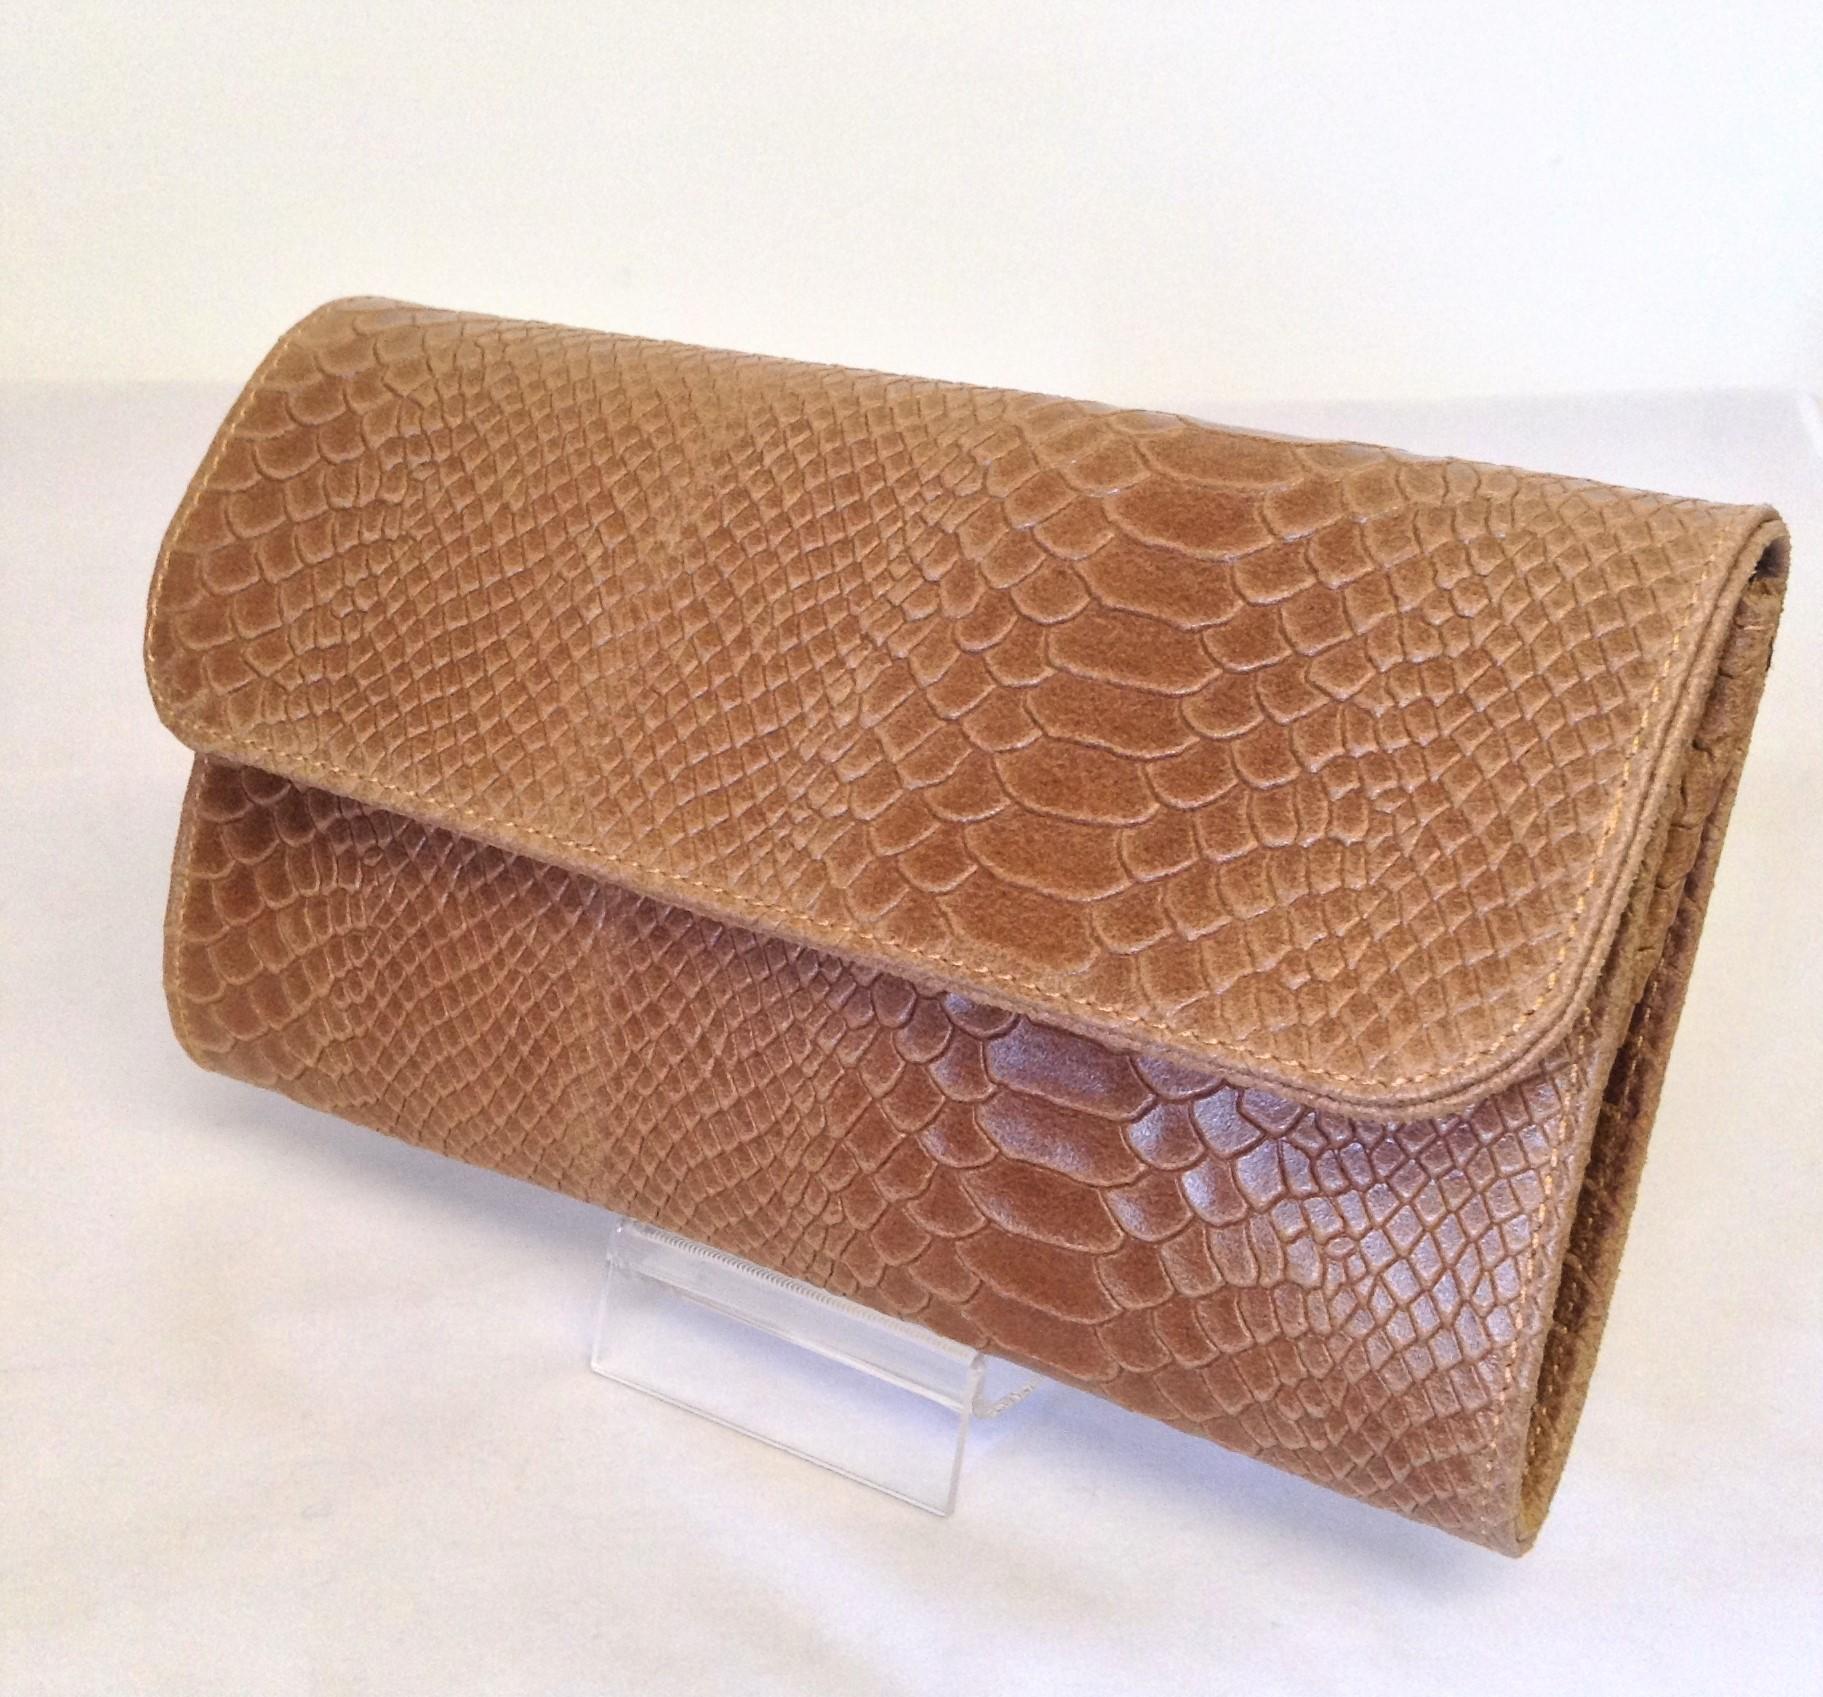 Light Tan Snakeskin Genuine Italian Leather Clutch Bag - Love4Bags